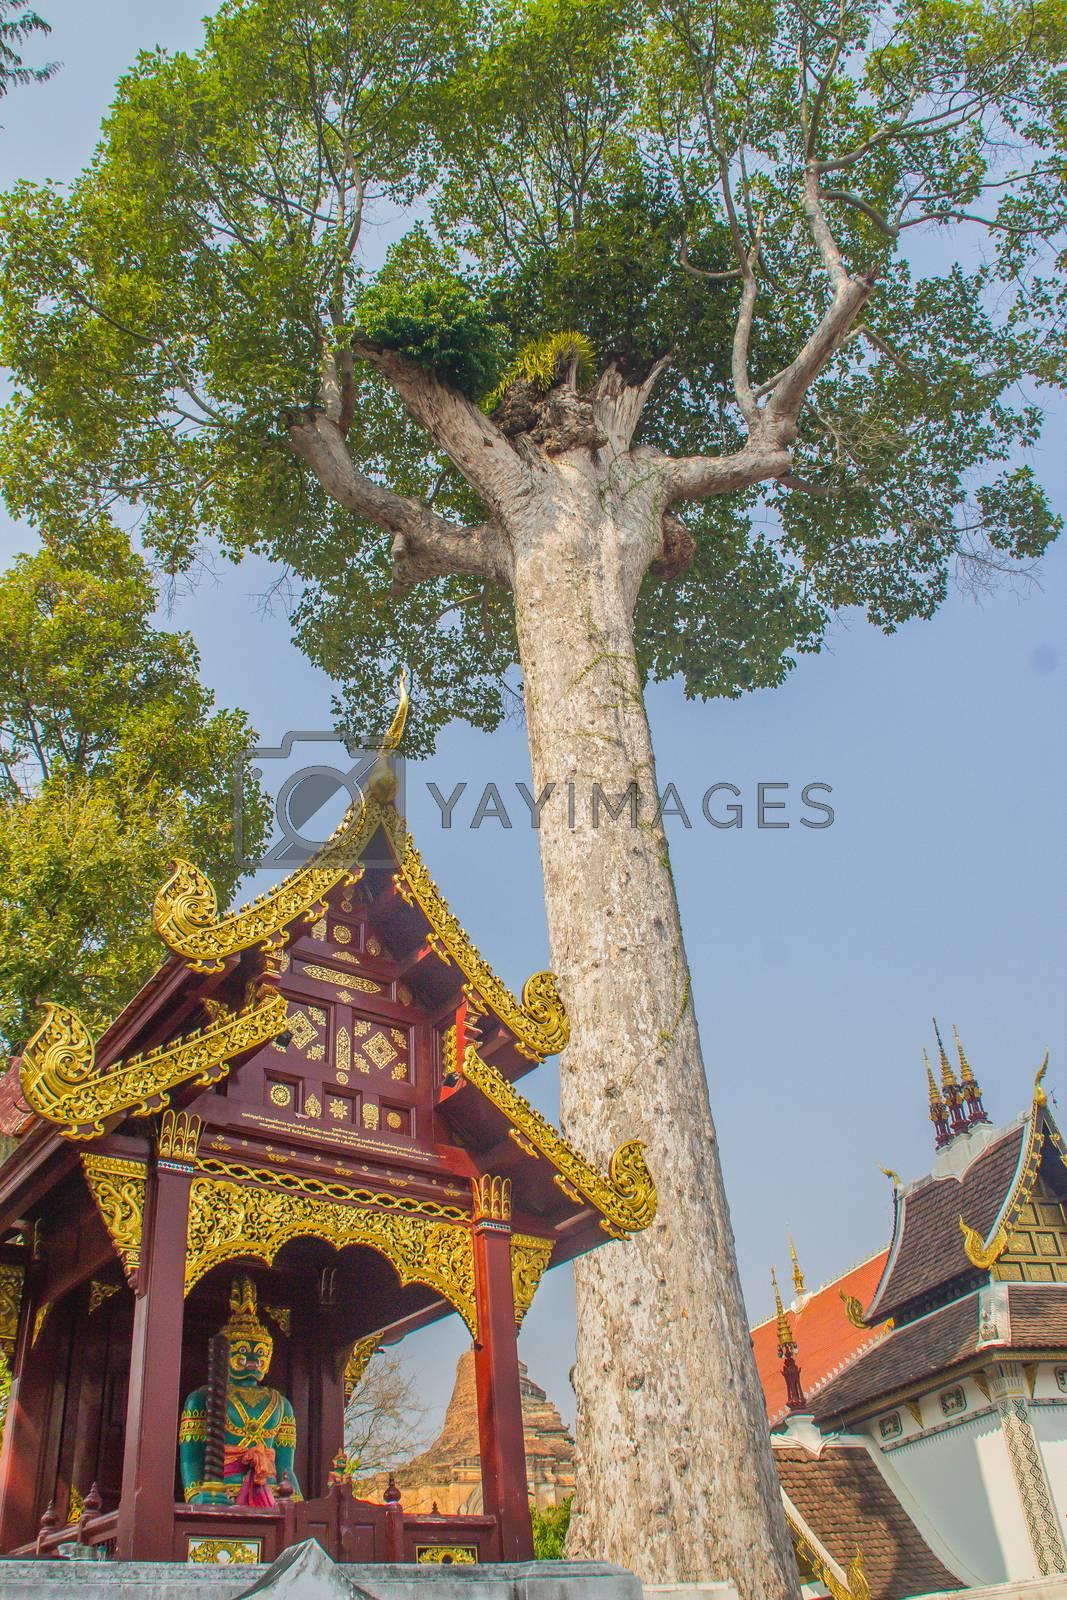 Beautiful exterior decoration outside the Chiang Mai City Pillar or Sao Inthakhin located at Wat Chedi Luang in Chiang Mai, Thailand.